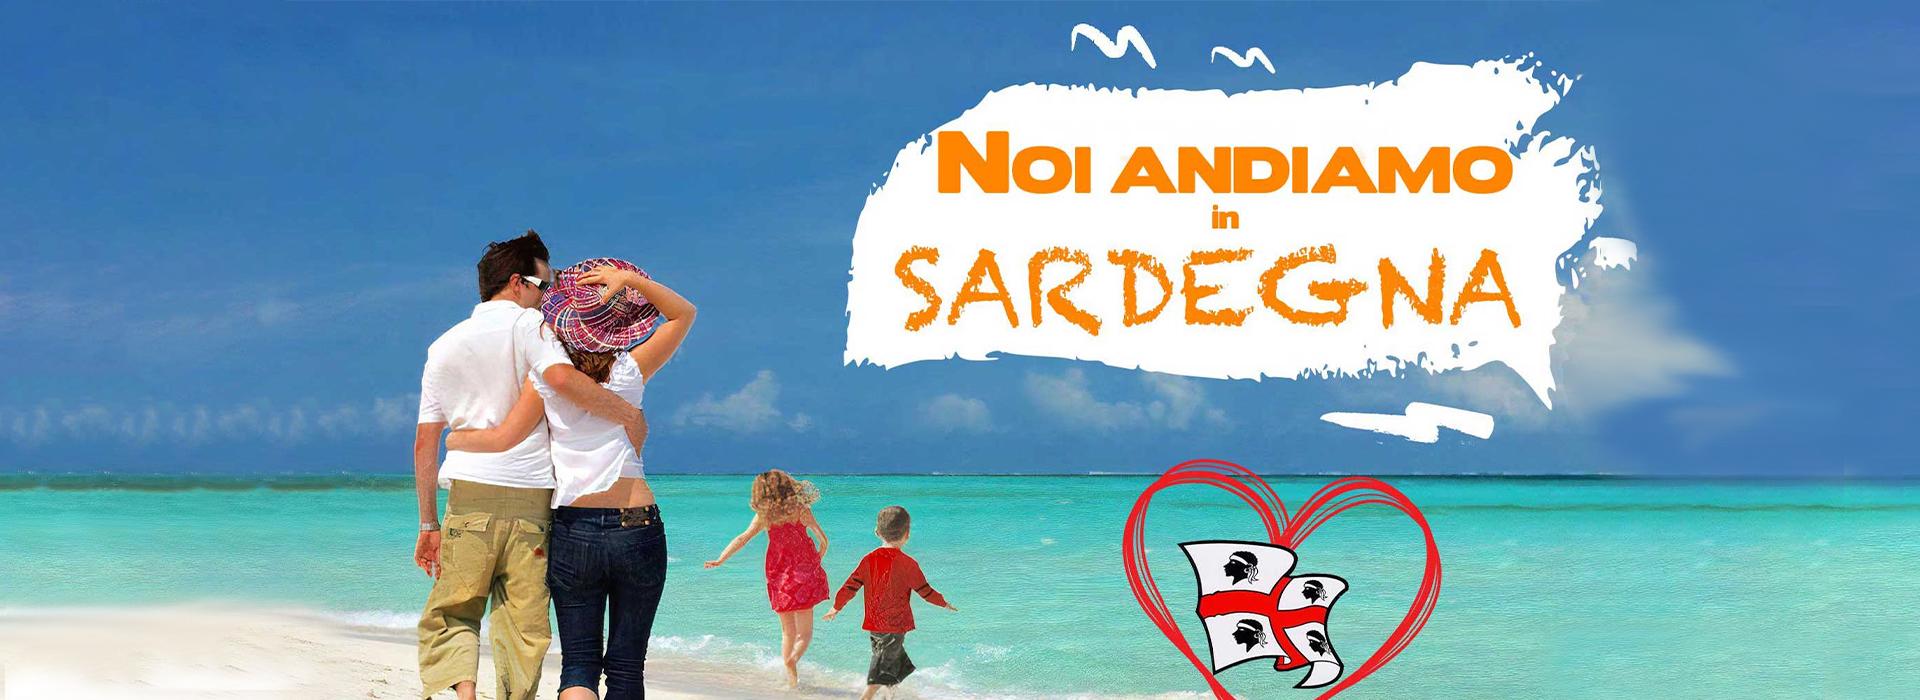 Vacanze Sardegna 2021: Offerta pacchetti vacanze Sardegna ...